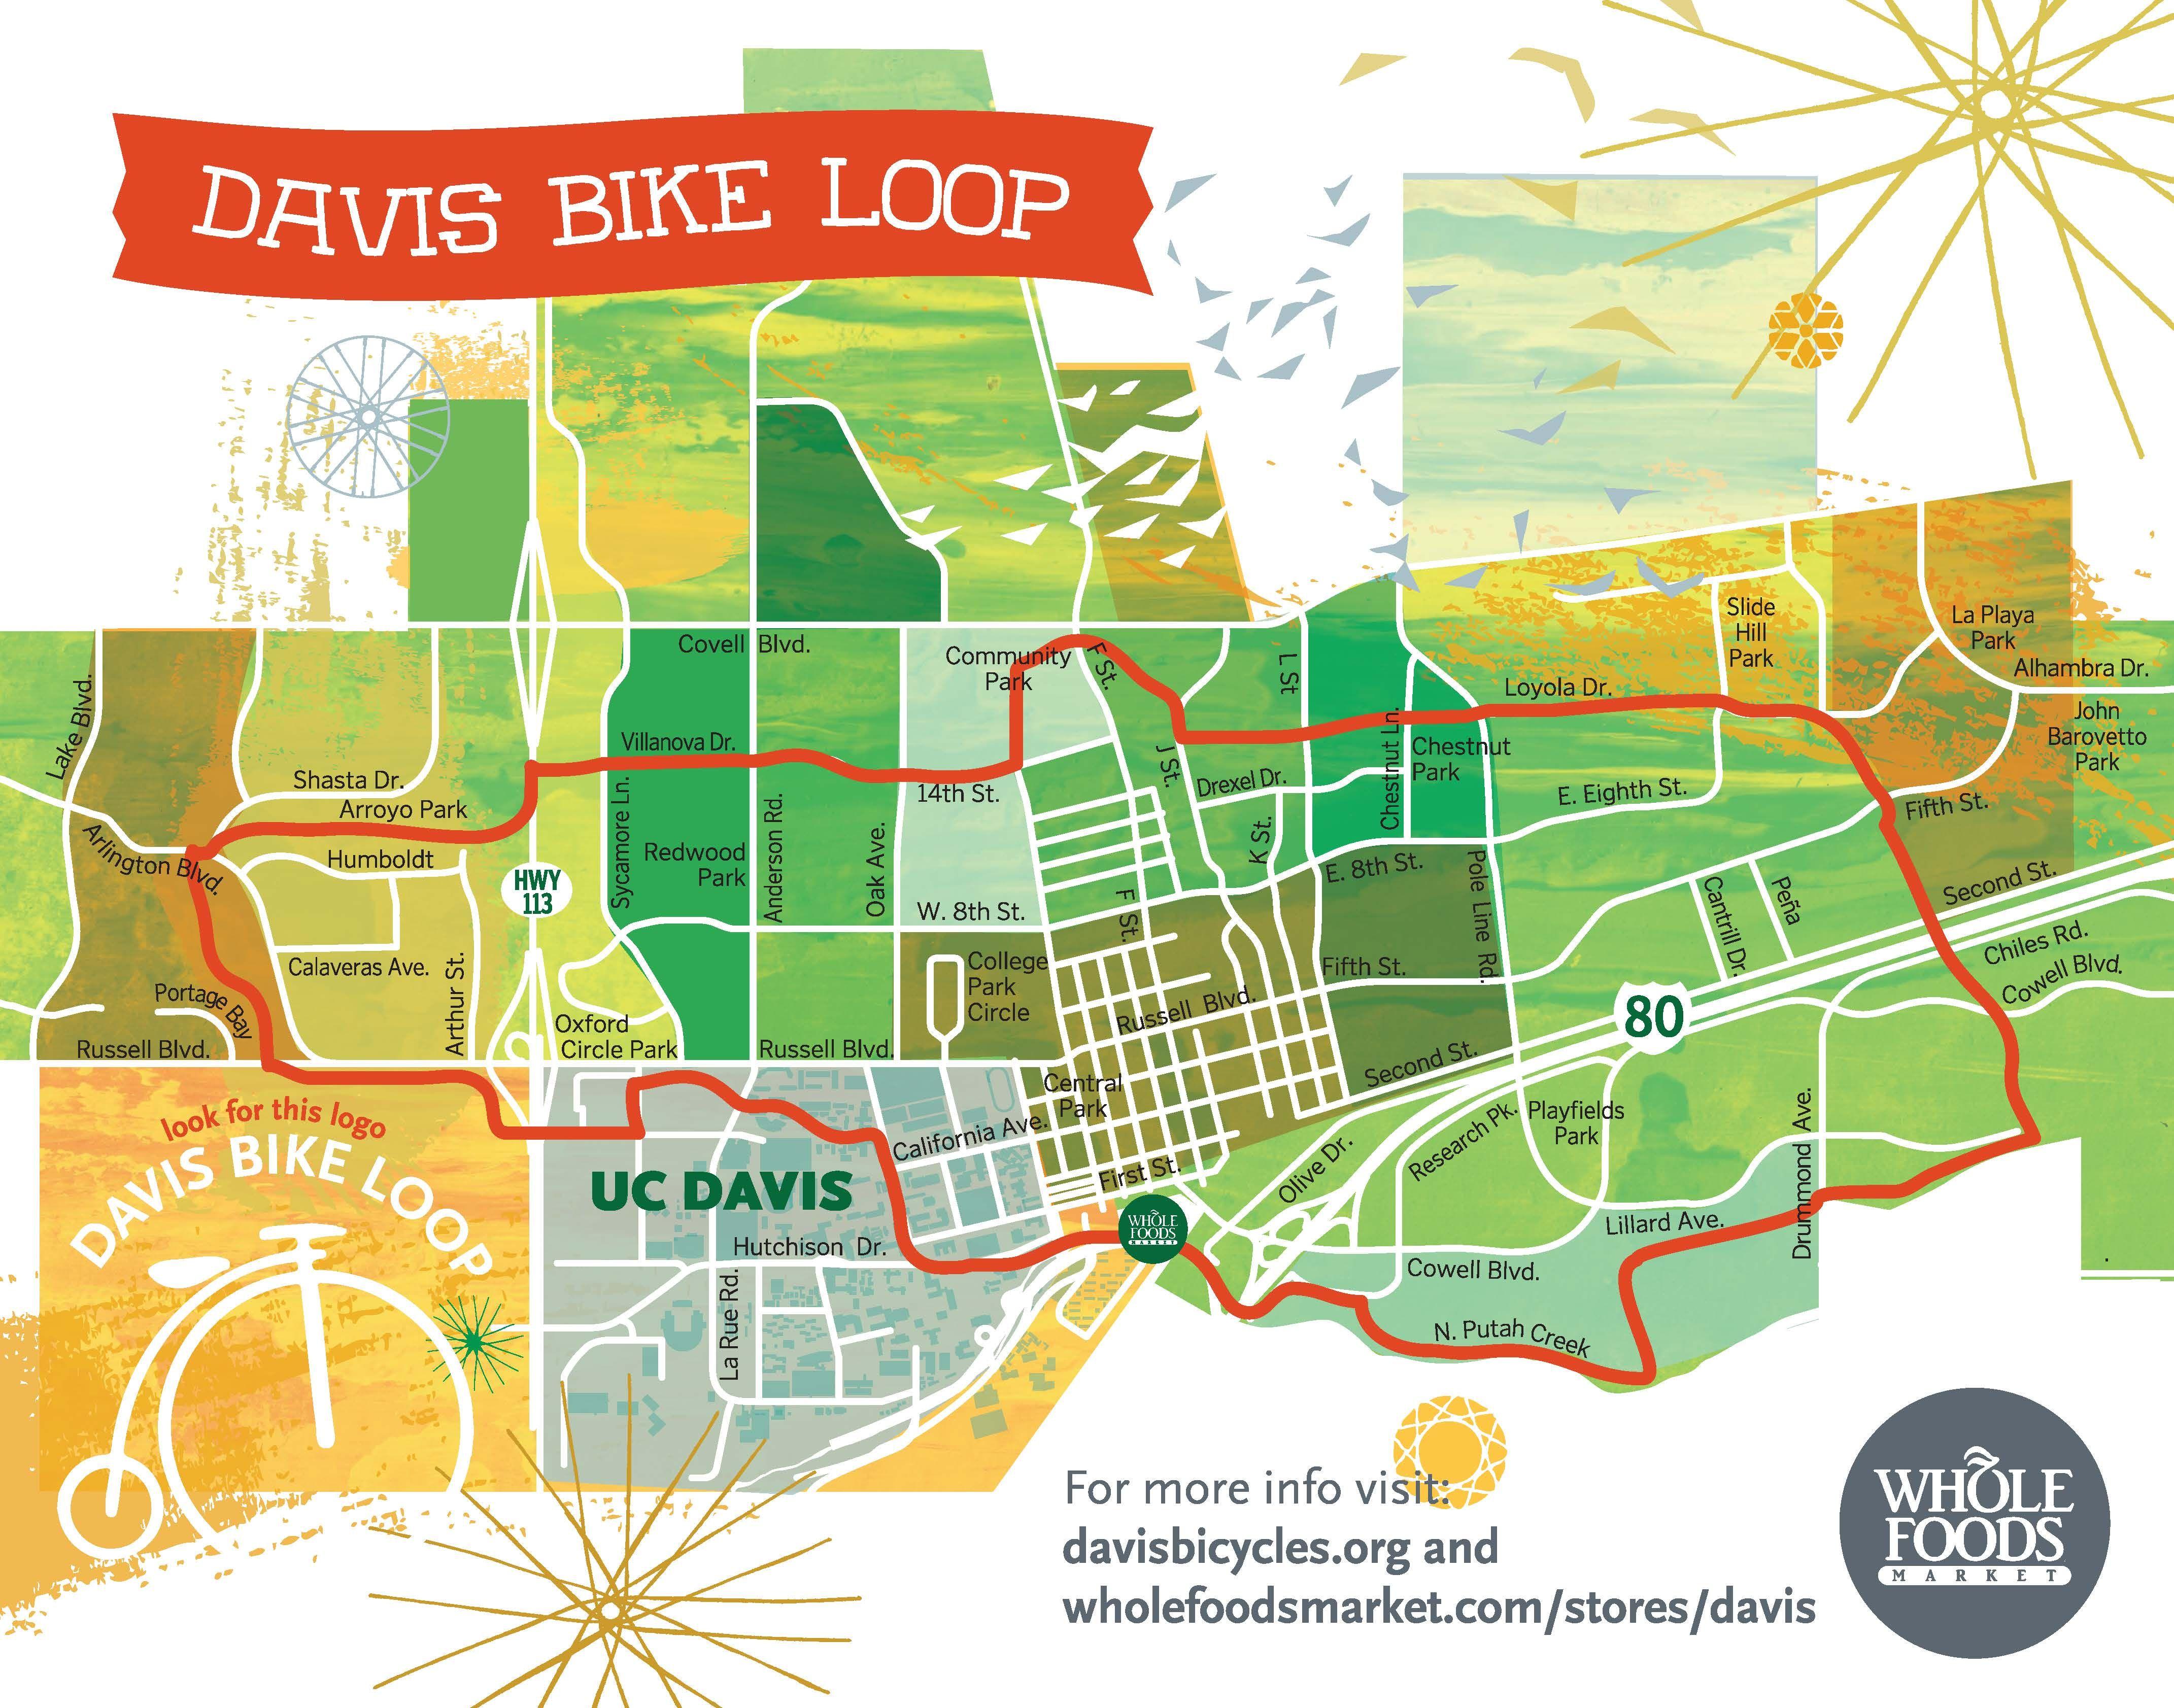 Davis Bike Loop! For more great maps visit www.yolocvb.org | Davis on